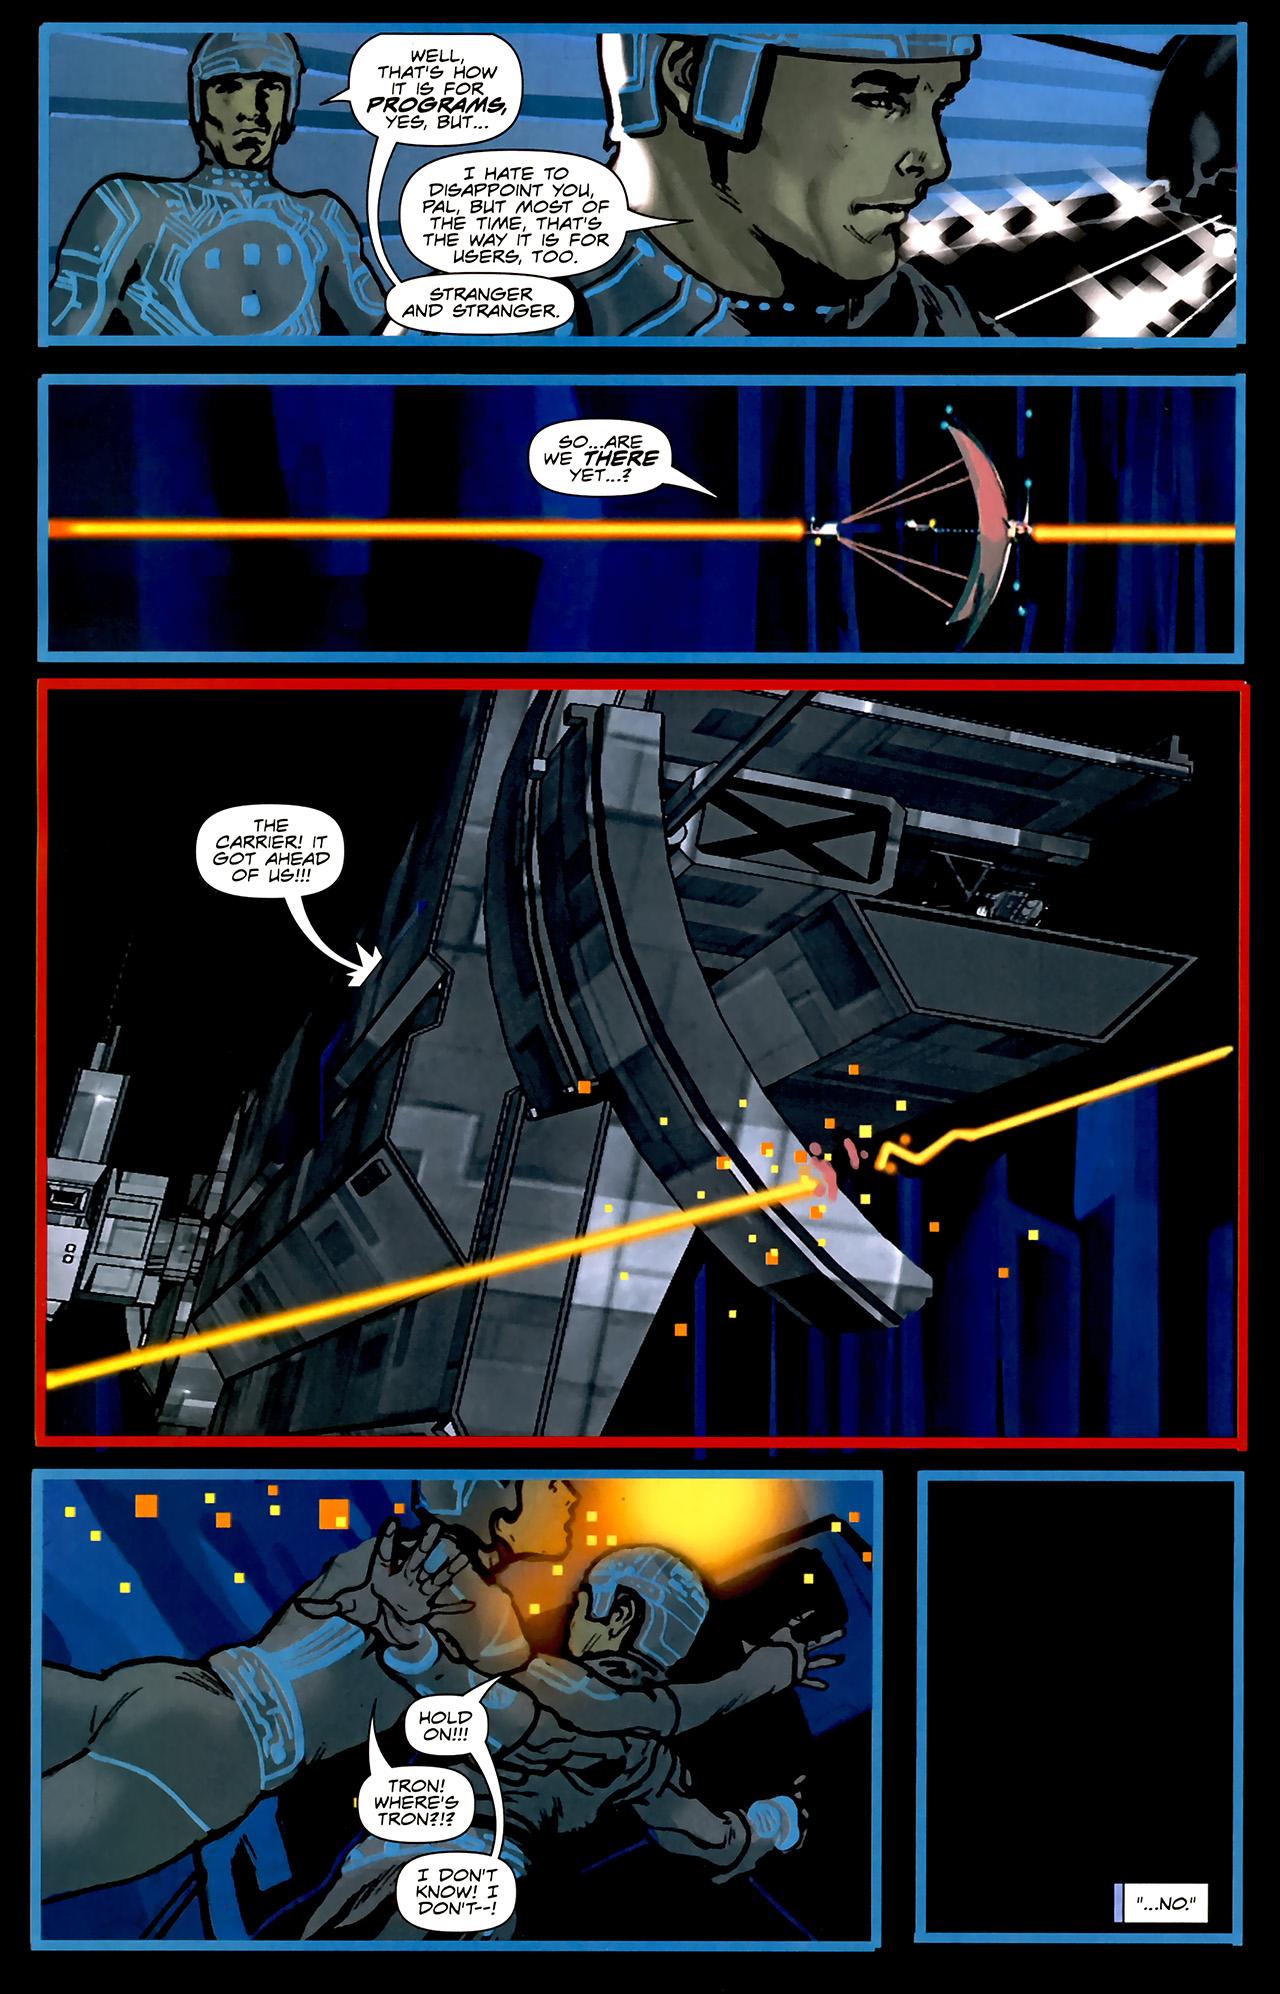 Read online TRON: Original Movie Adaptation comic -  Issue #2 - 23